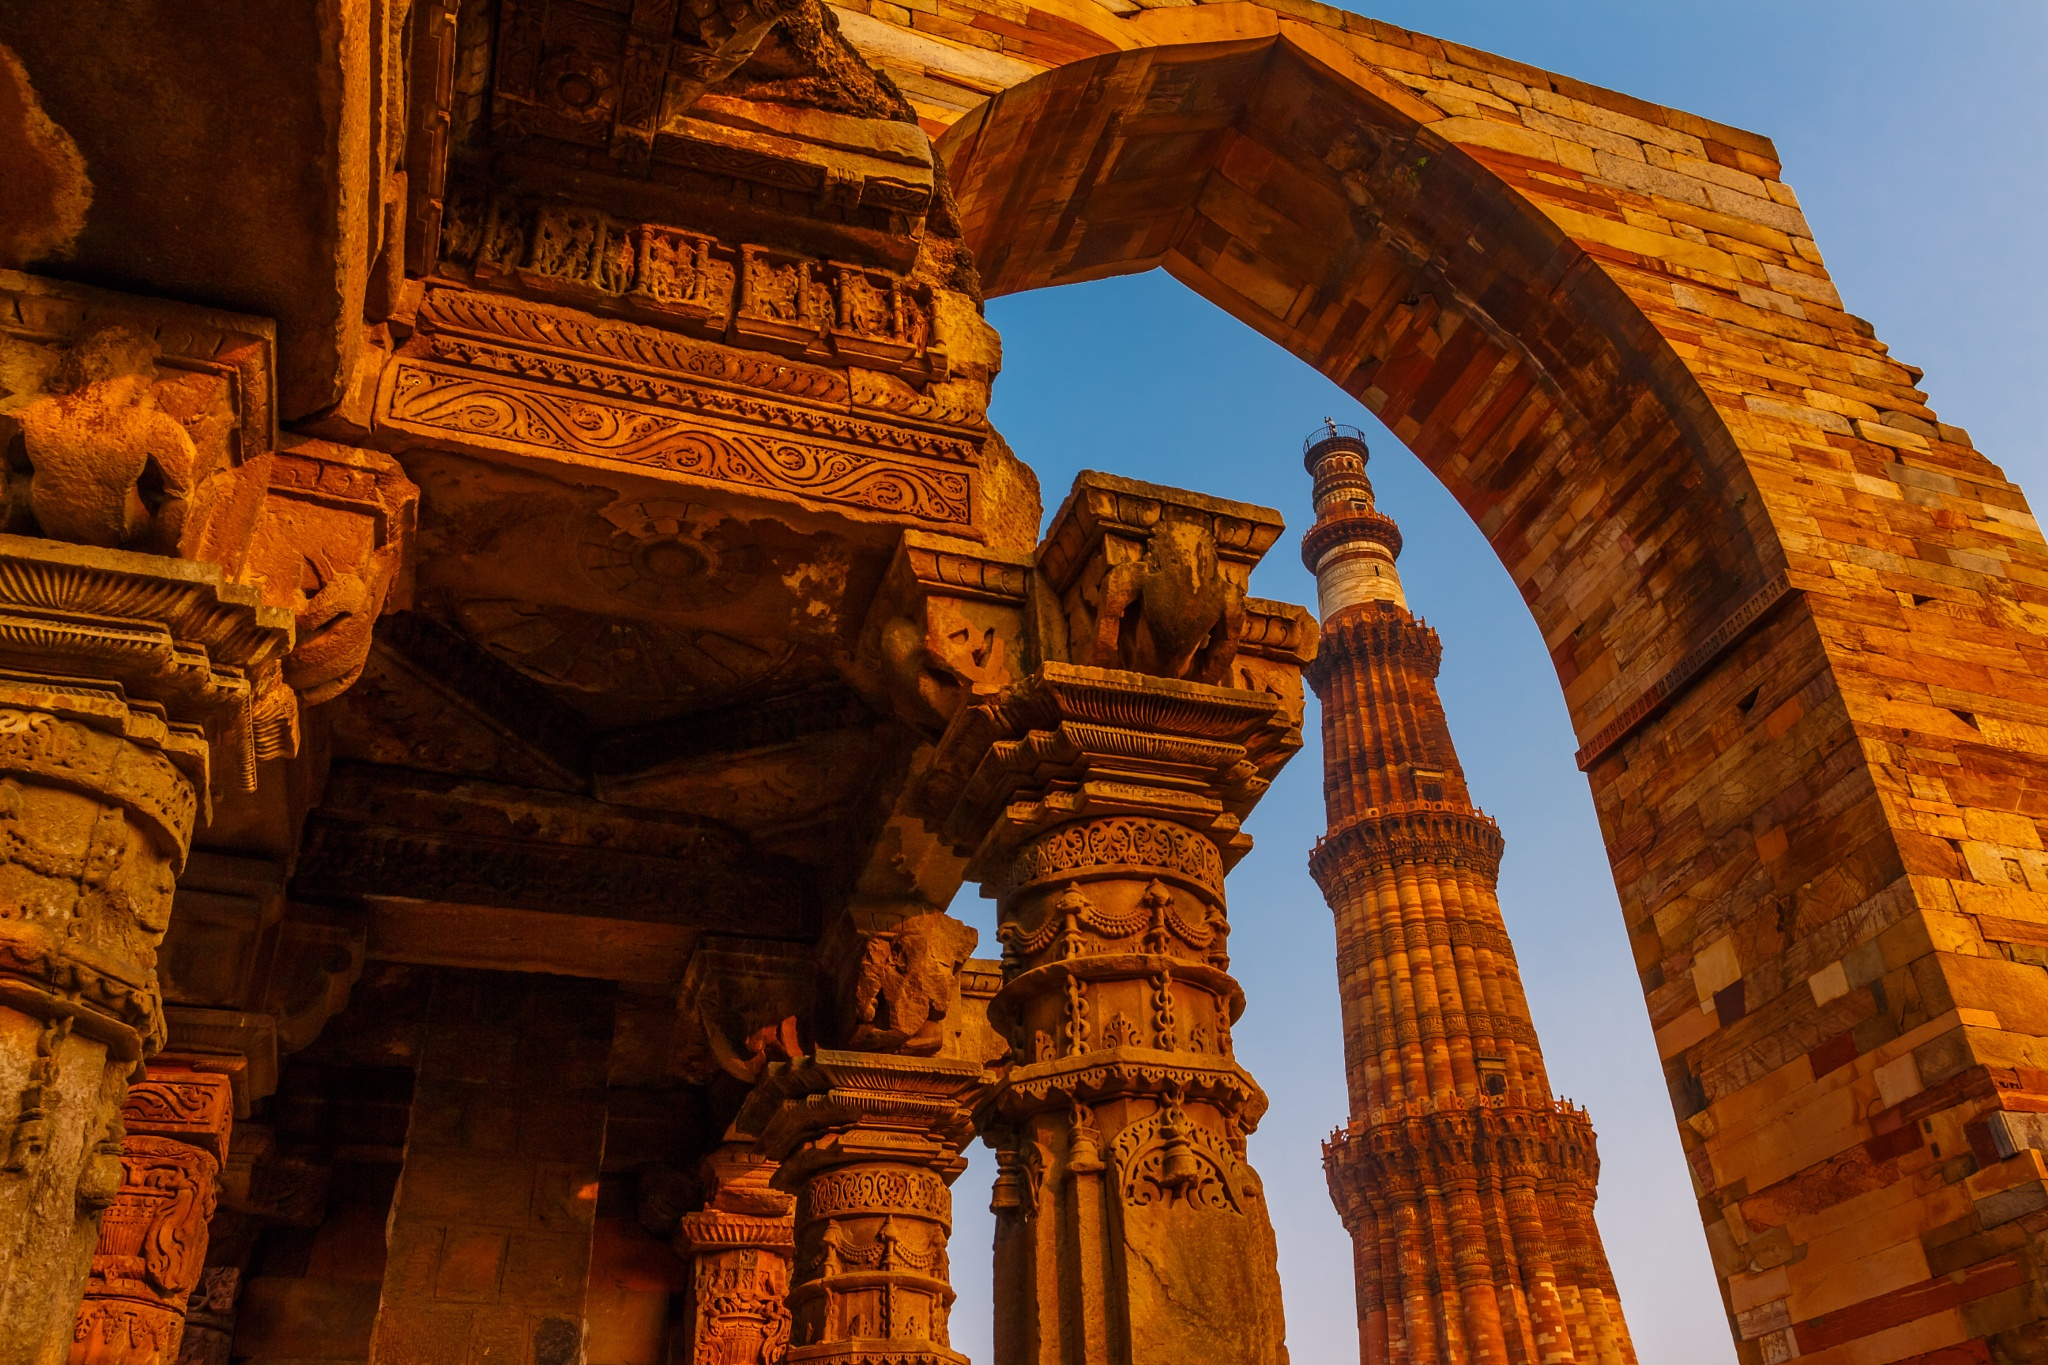 Qutub Minar different framing #architecturecontest by Anurag Banerjee